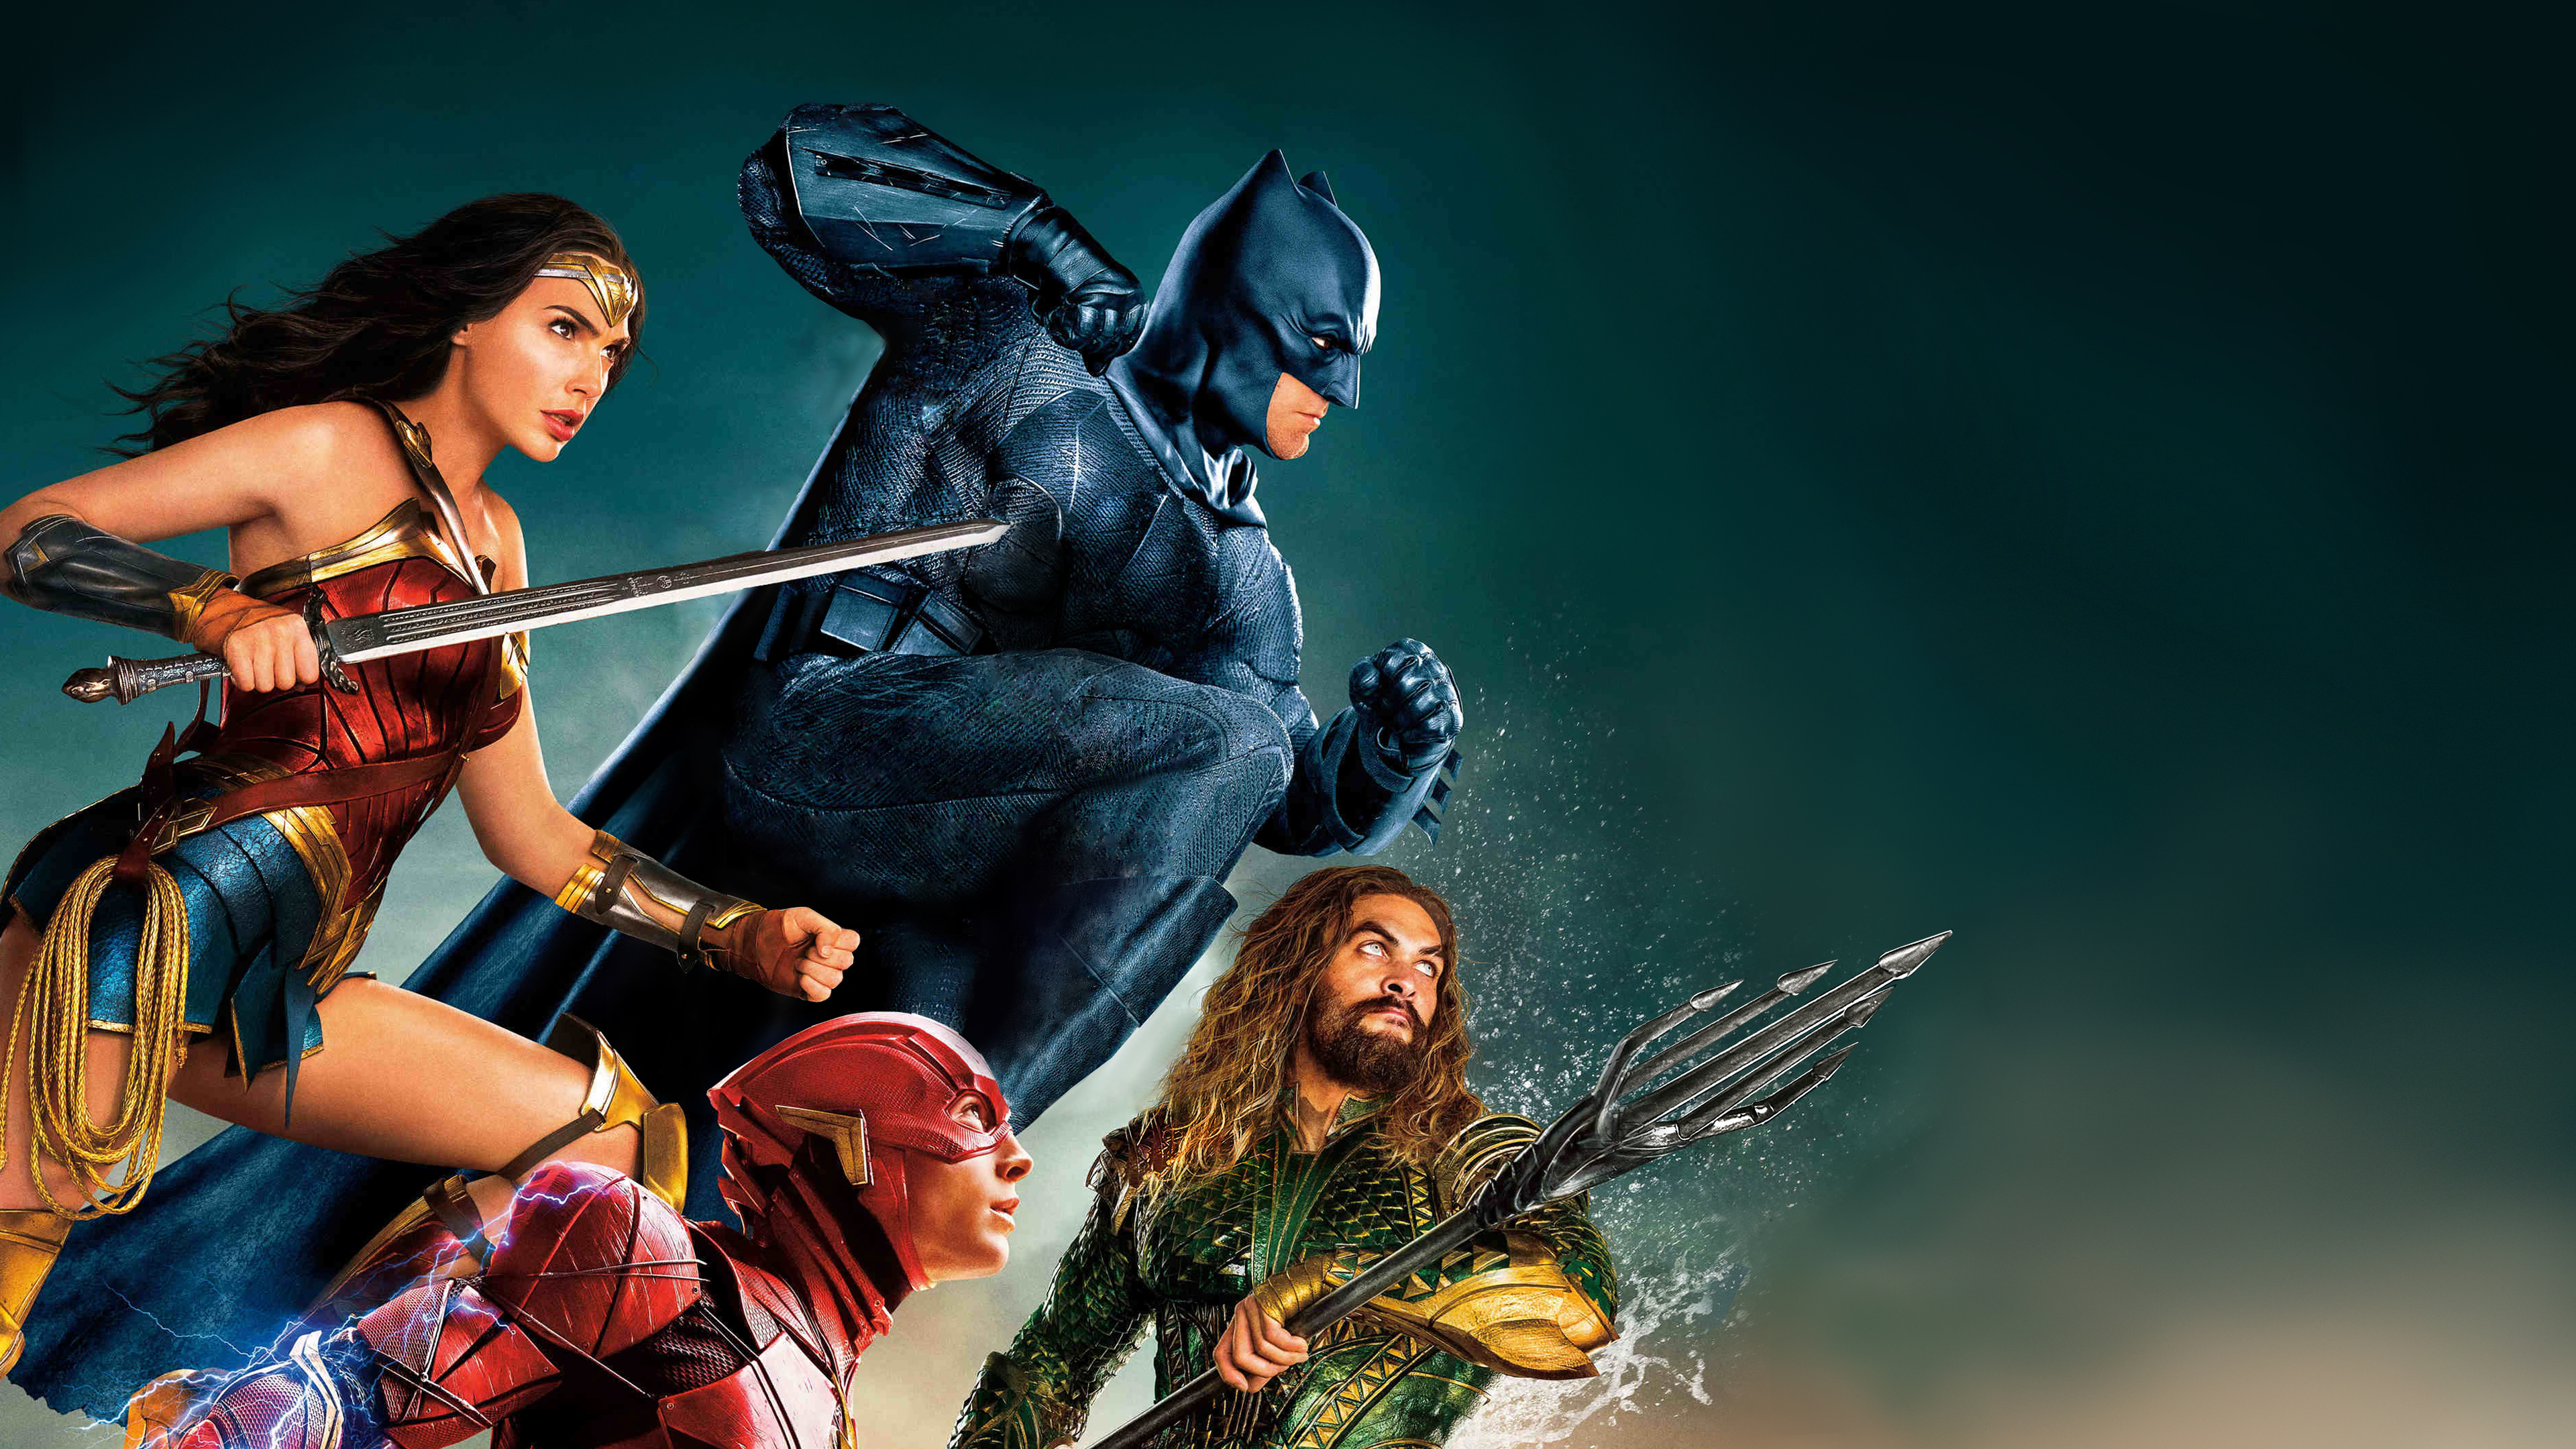 Justice league, movie, superheroes, 3840x2160 wallpaper